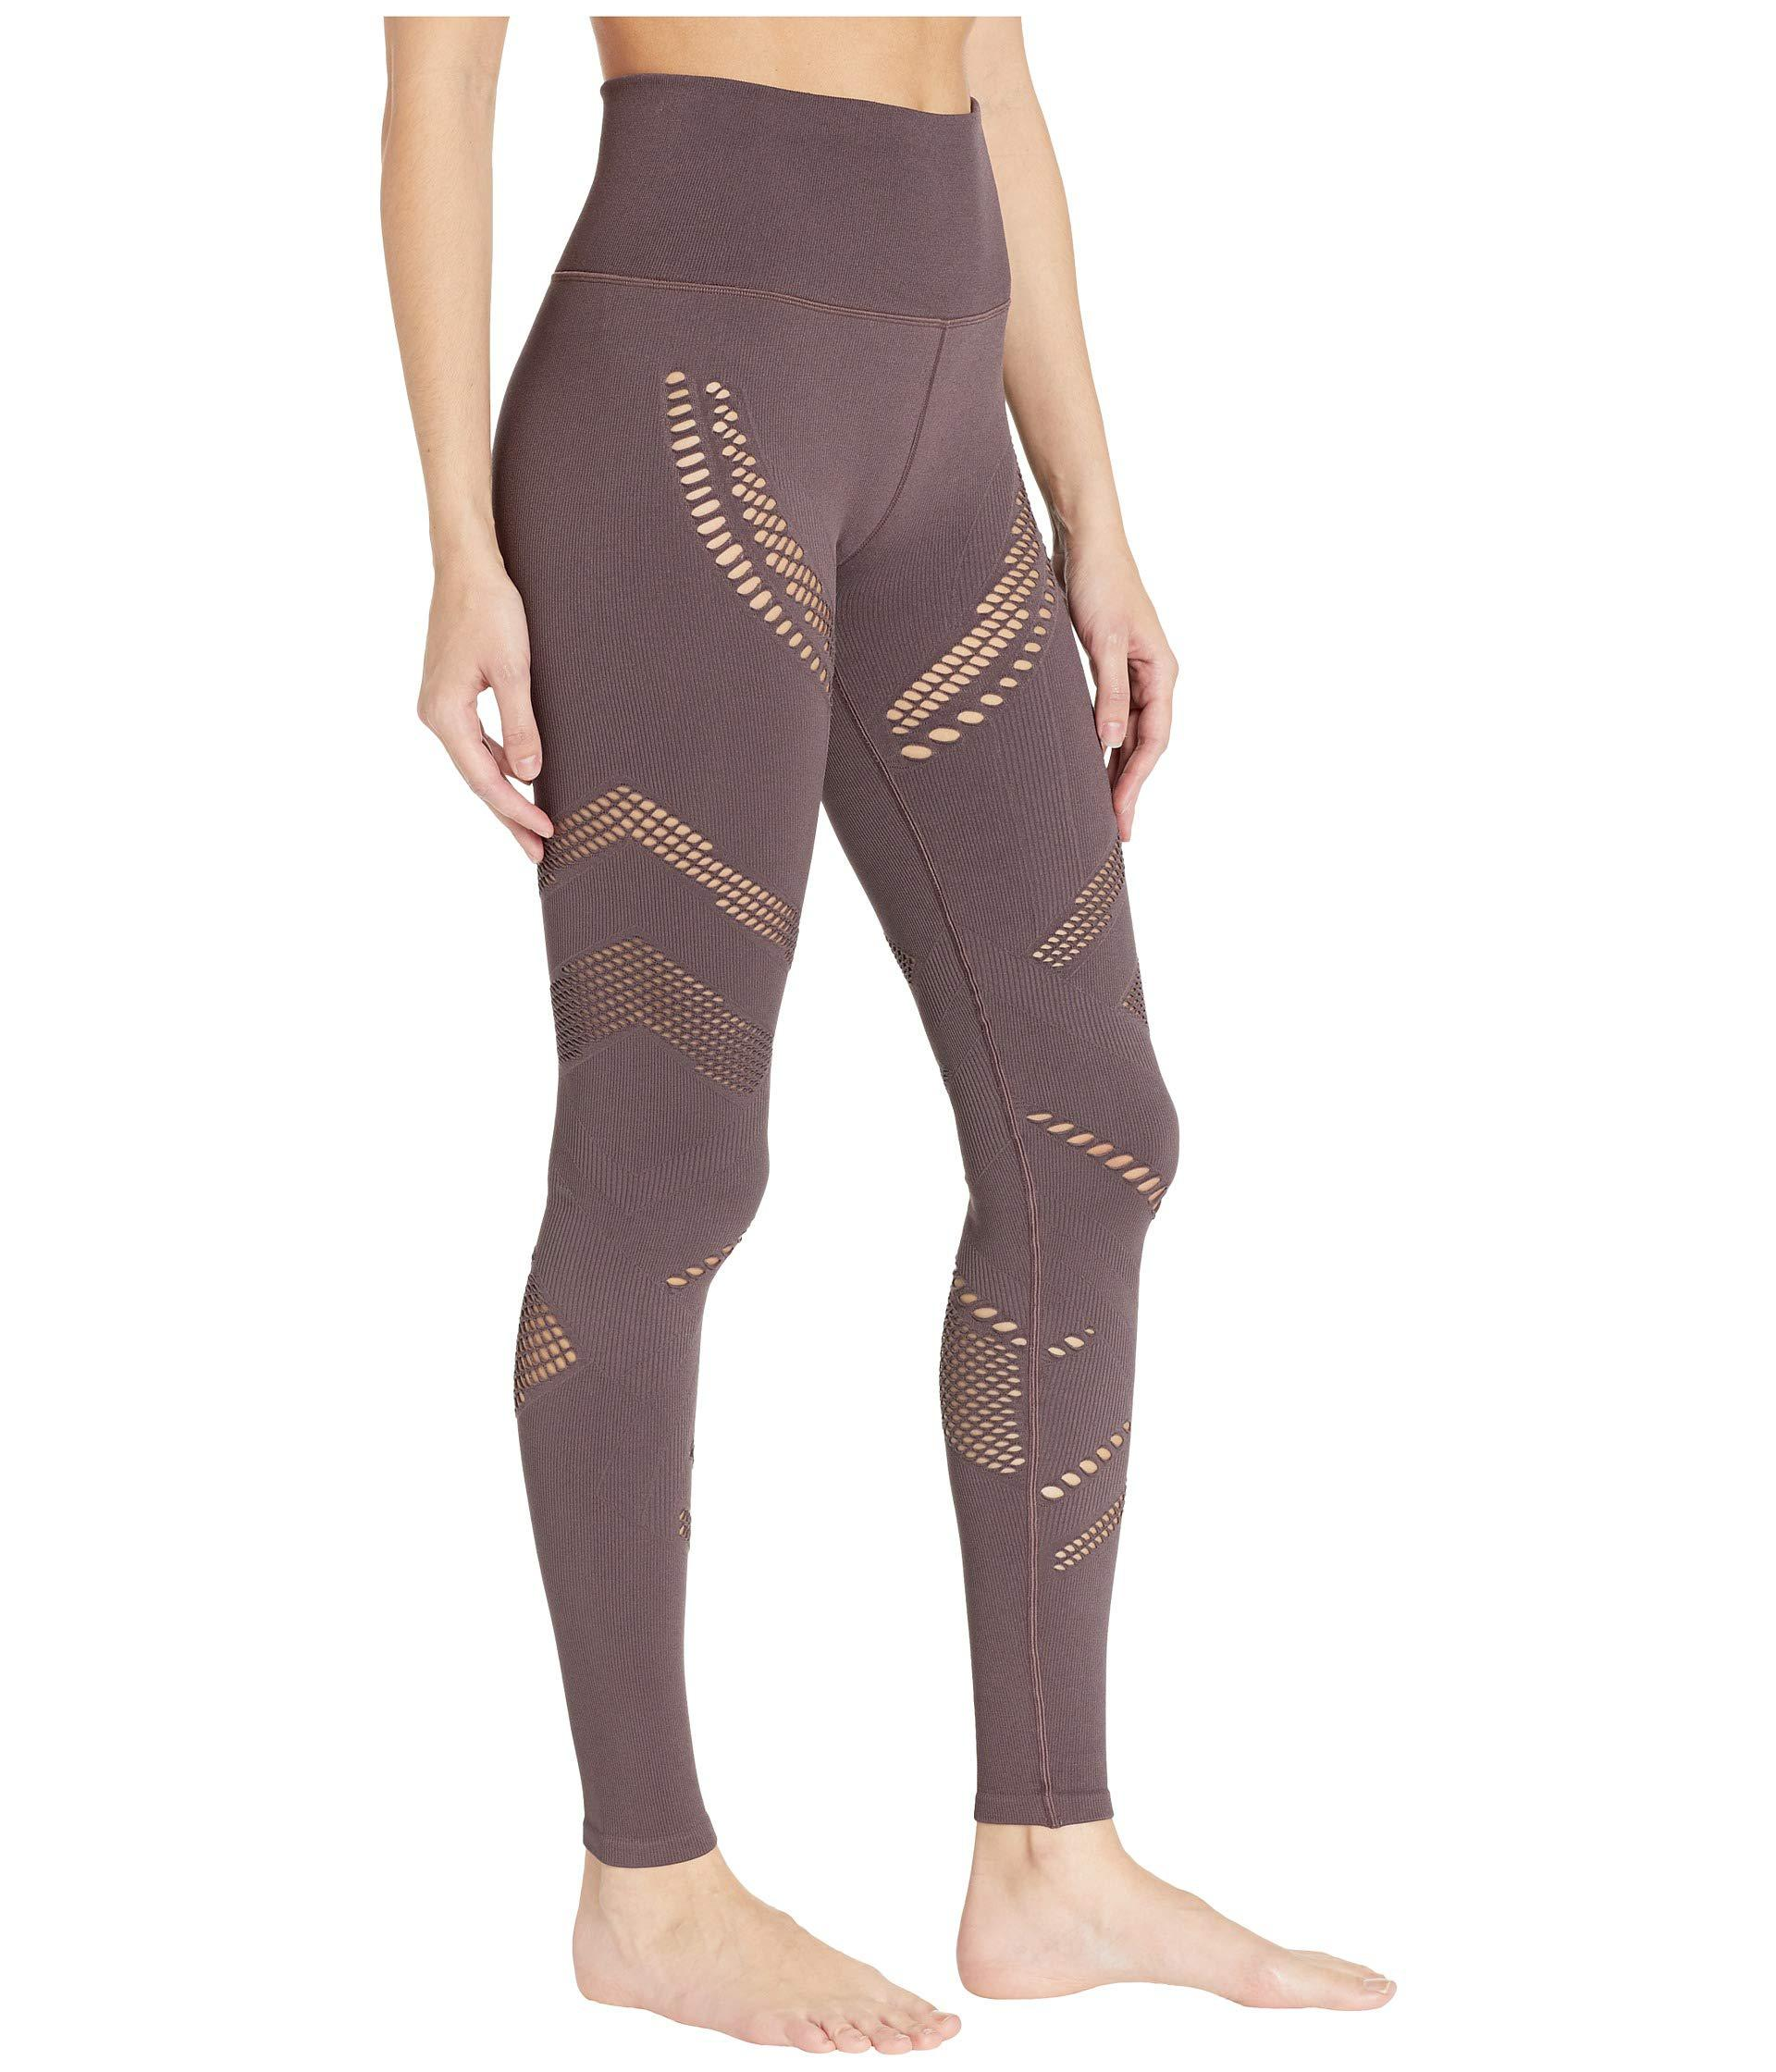 4a1aac42754e8 Alo Yoga High-waist Seamless Radiance Leggings (black) Women's ...